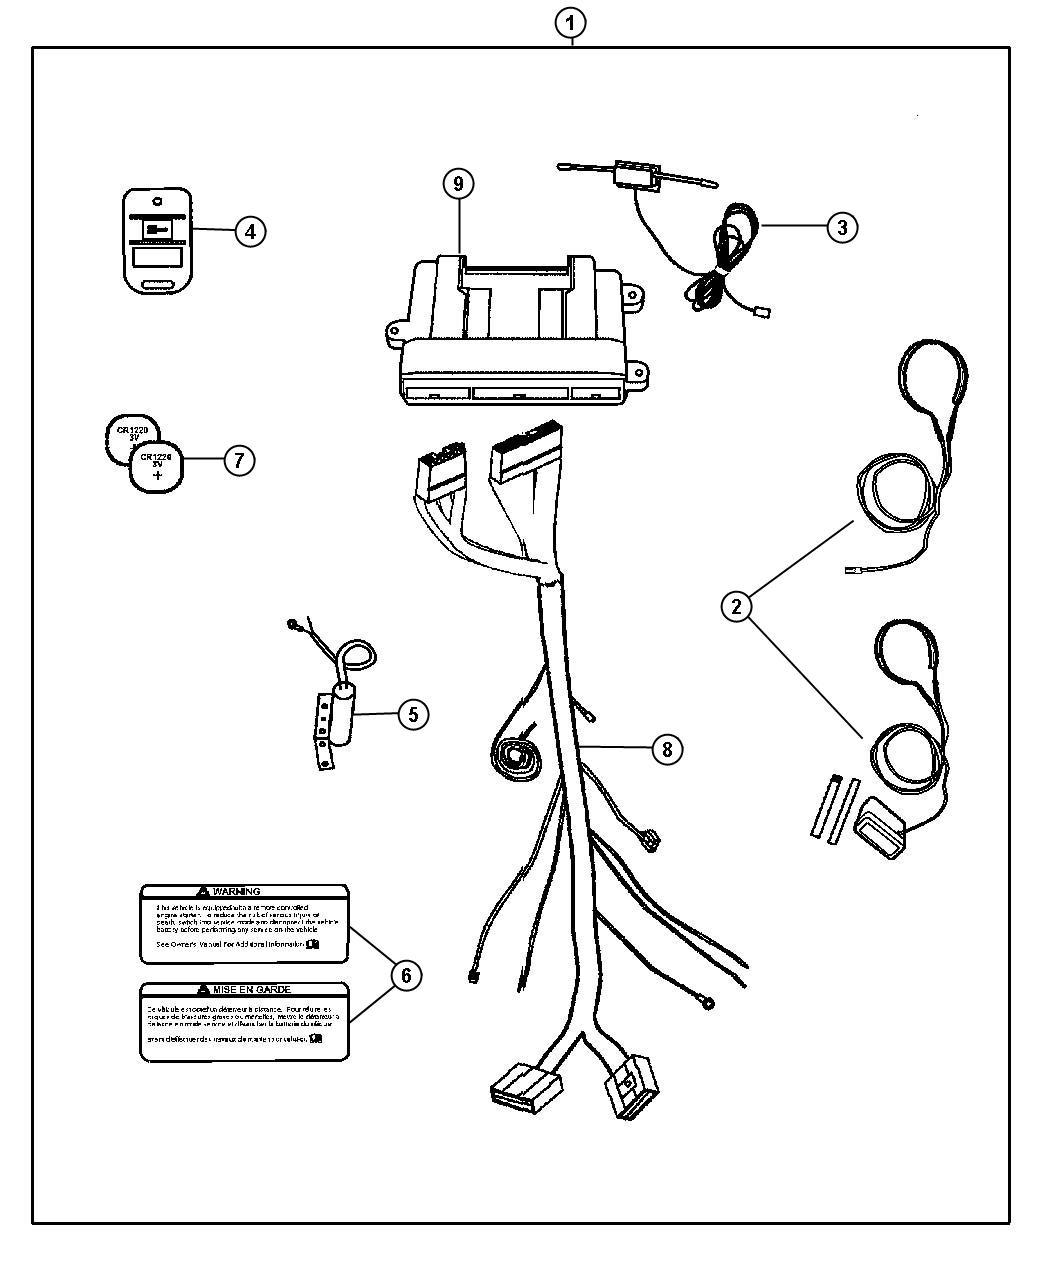 2006 dodge ram 2500 power wagon parts diagrams  dodge